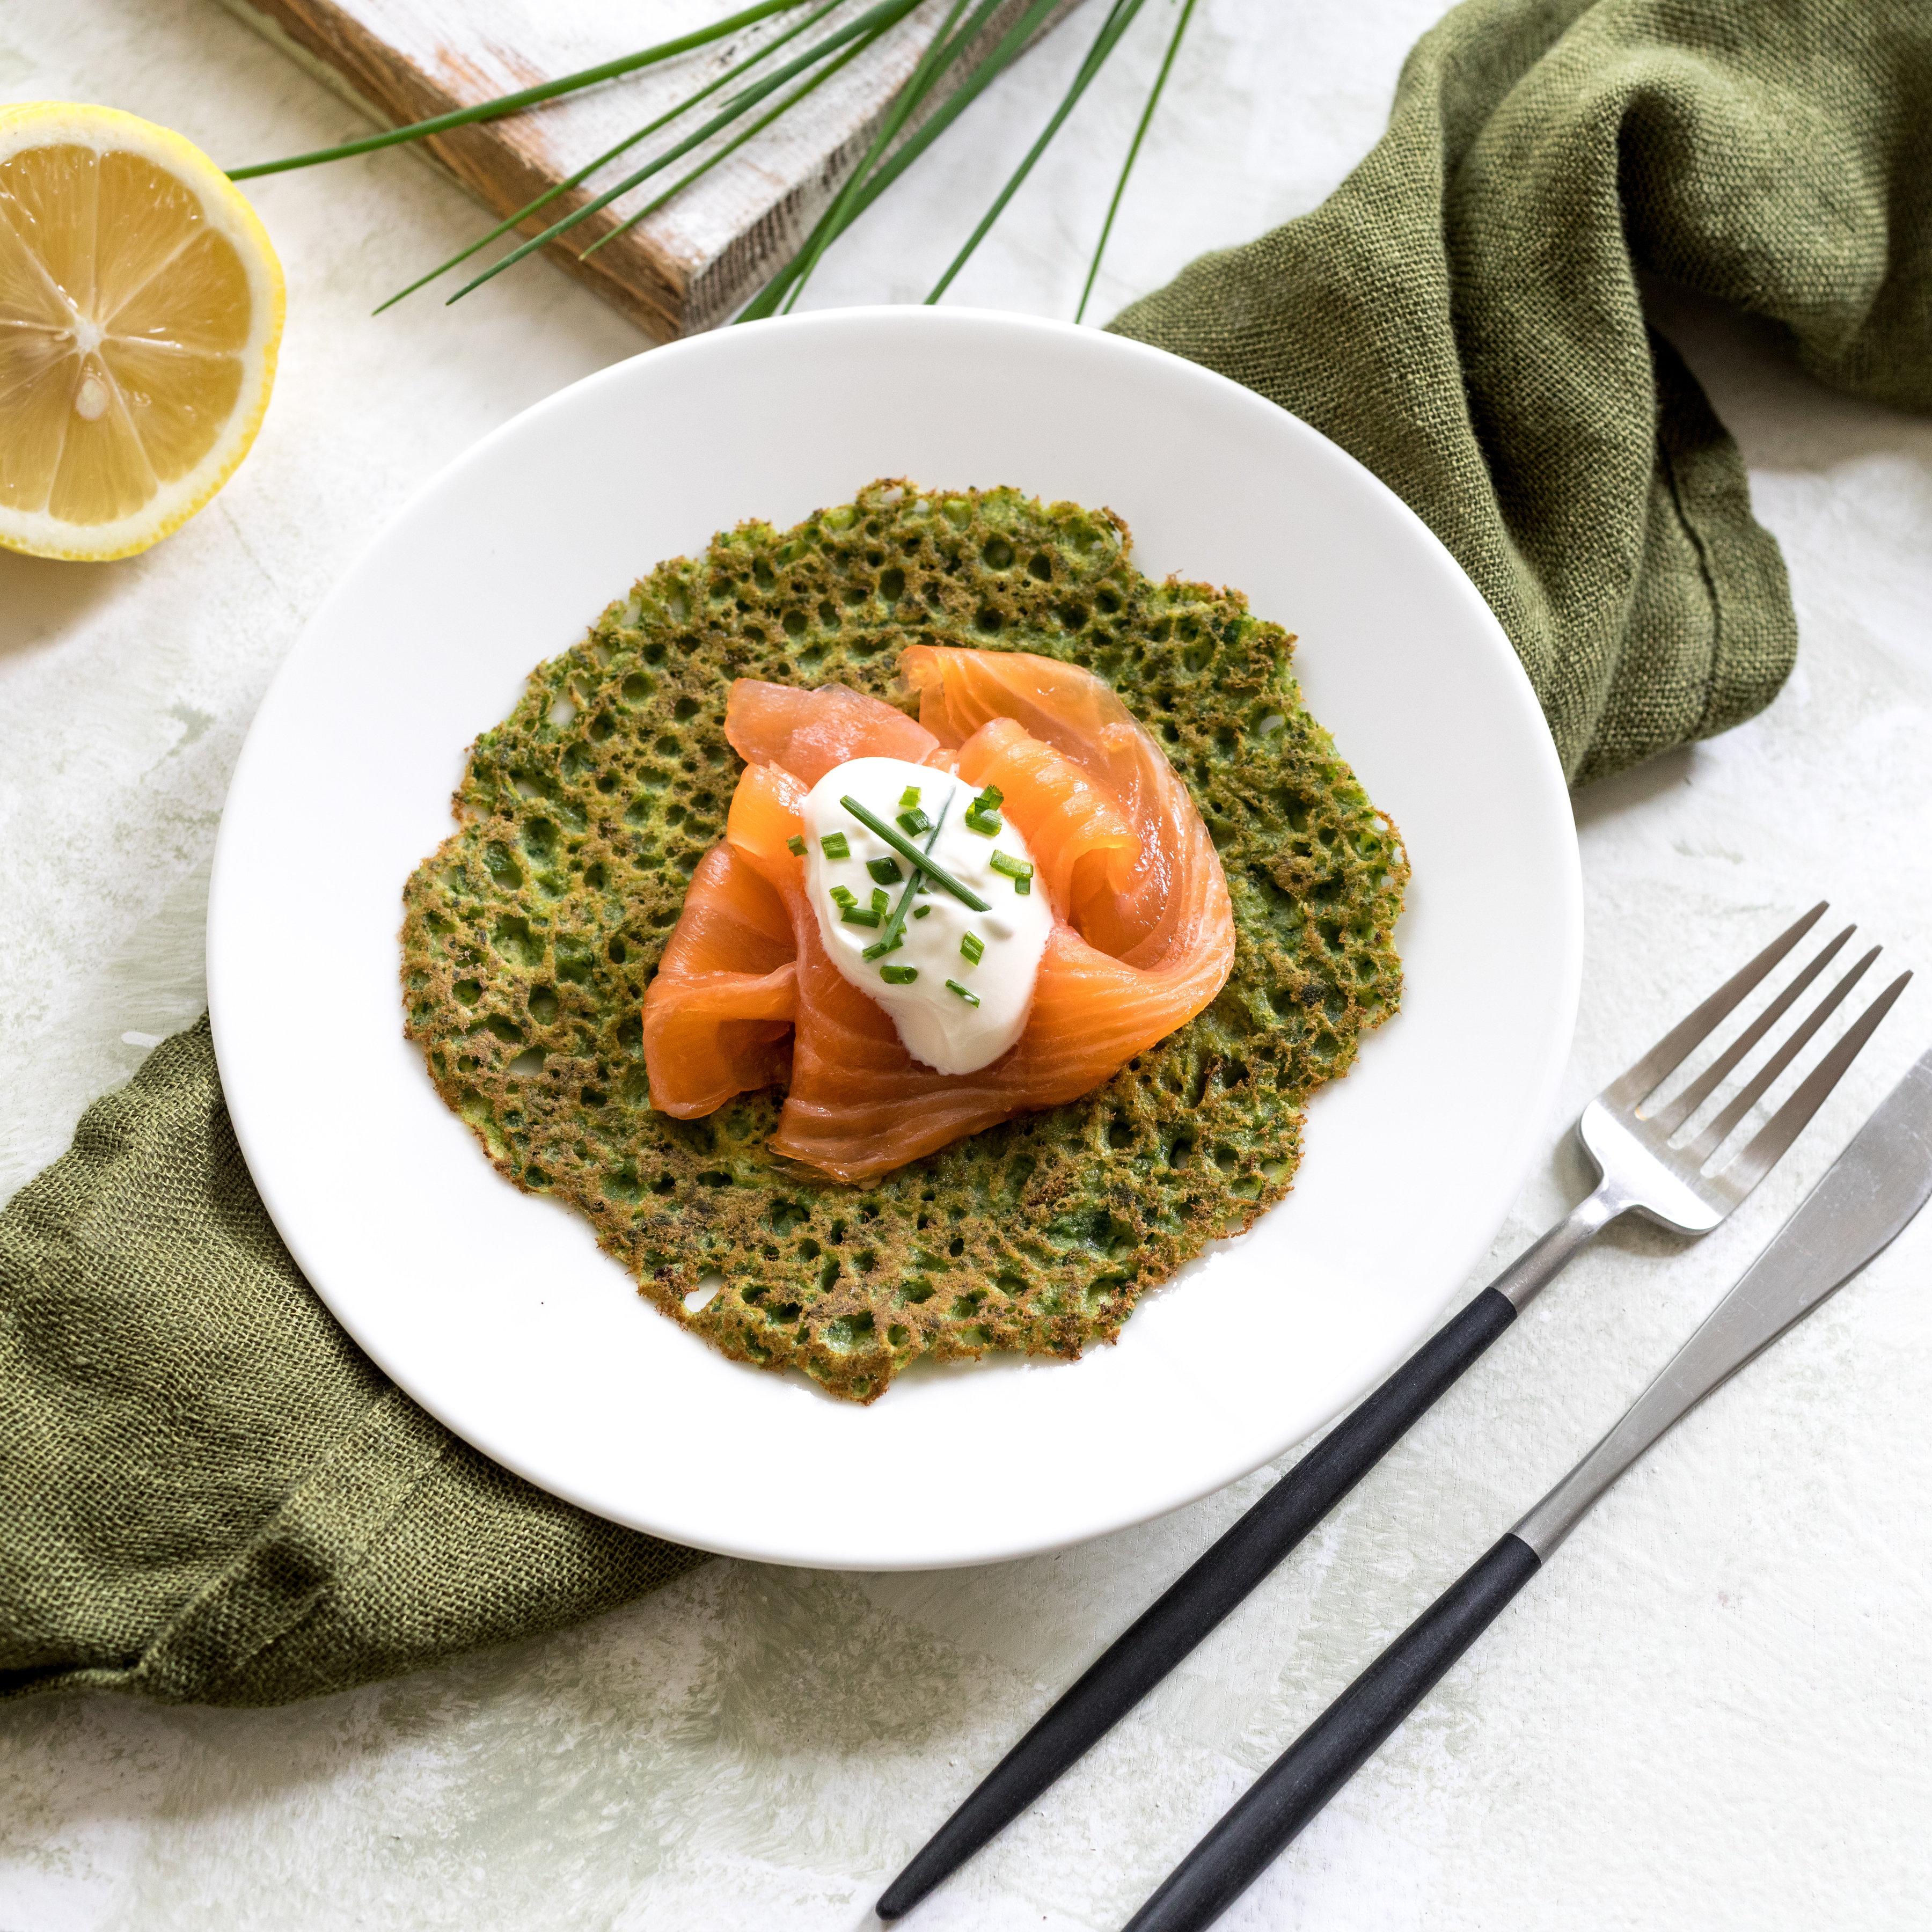 Gluten-Free Spinach & Buckwheat Pancakes